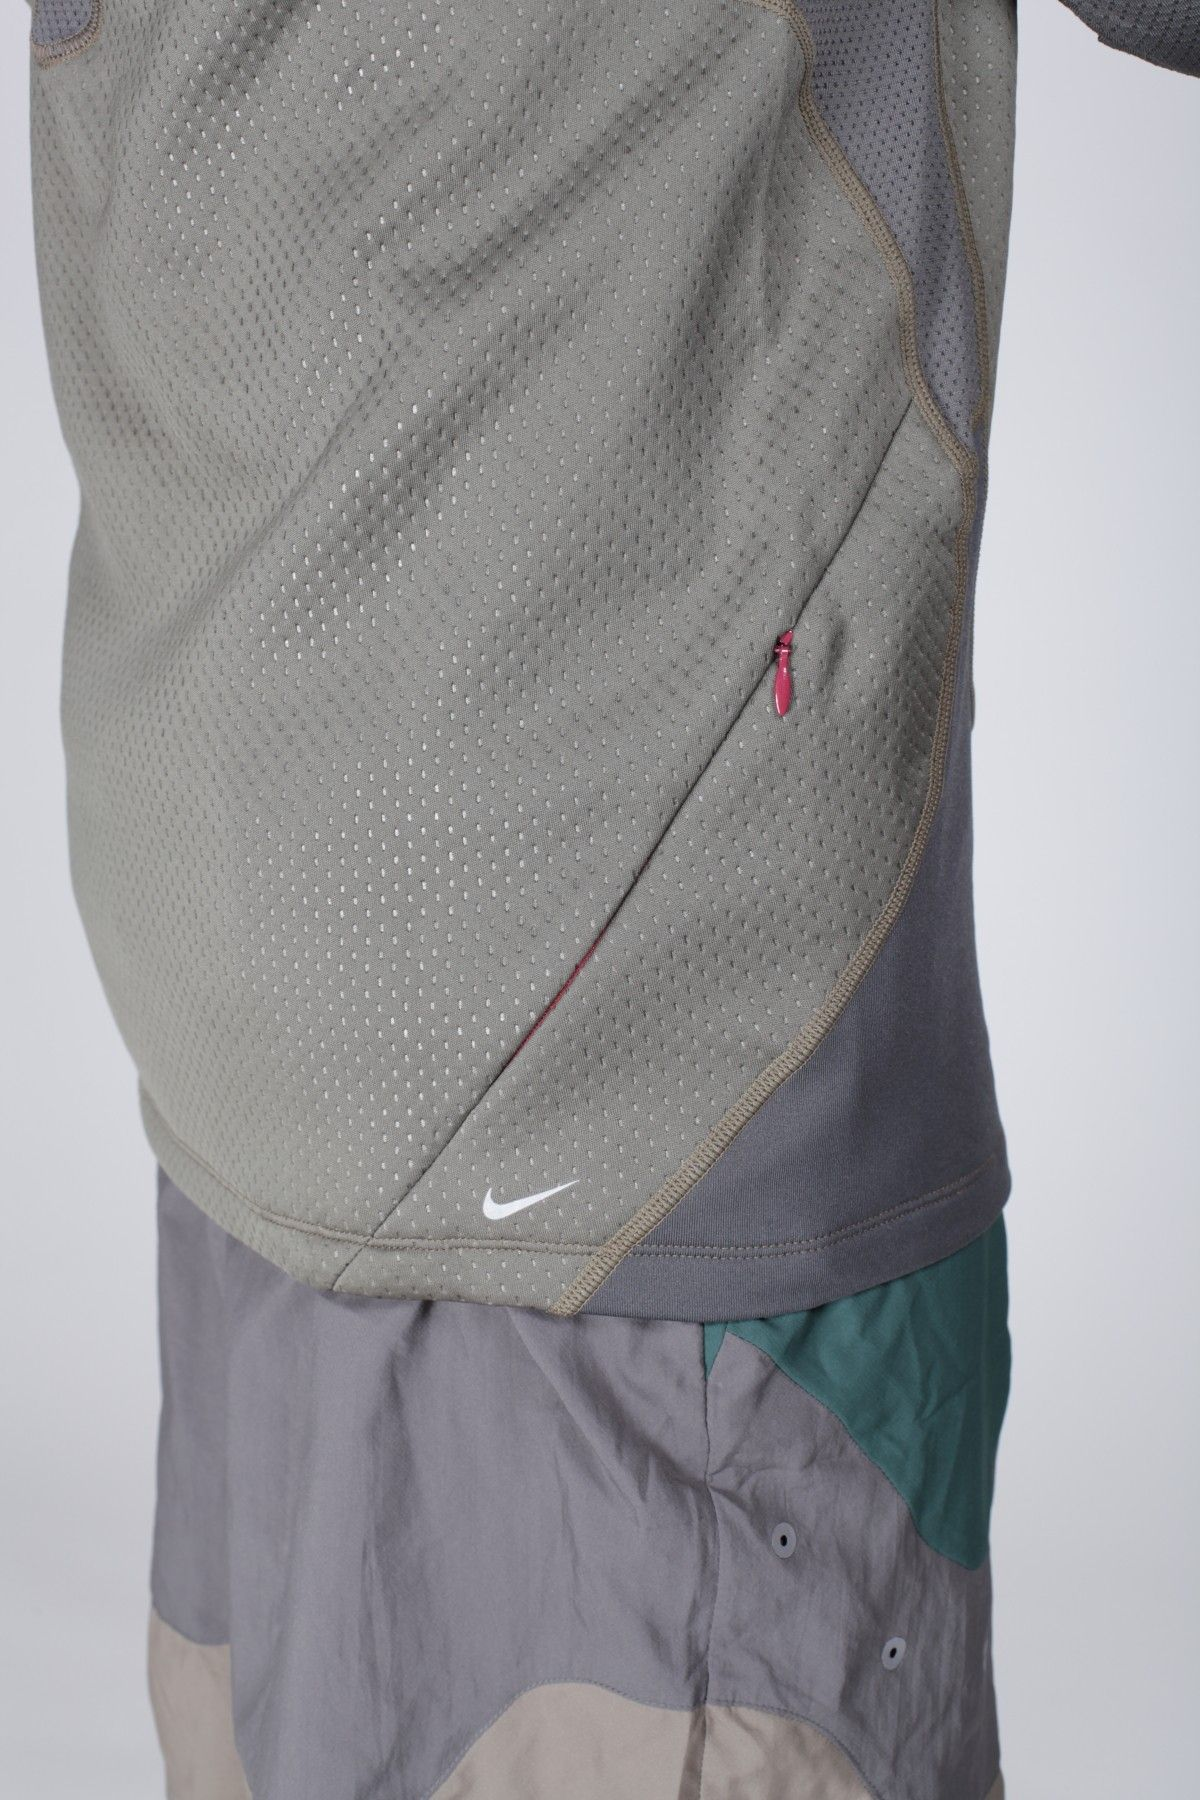 Thermal Dope Uc Covers Ls Book Brand Top Factory Nike UwwqCX